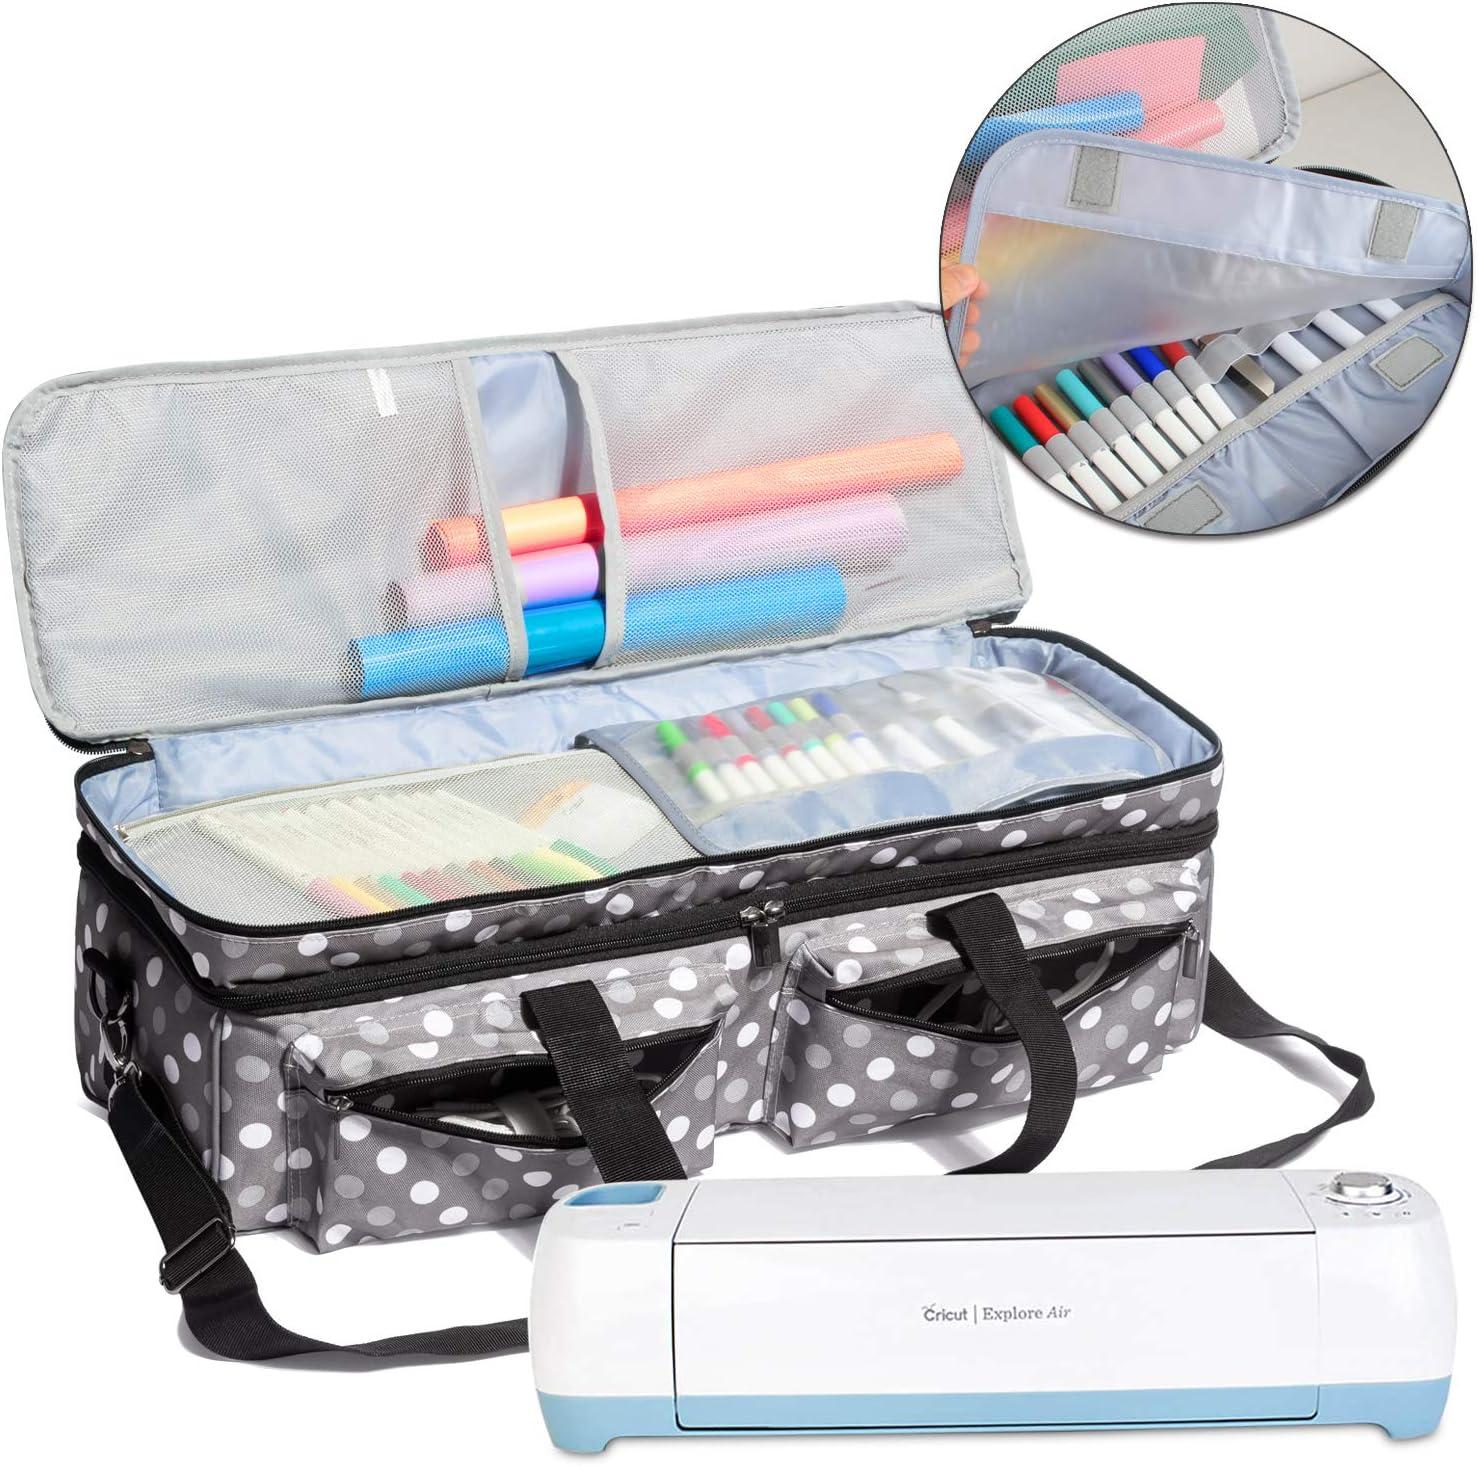 Luxja Bolsa para Silhouette Portrait 2, Organizador de Cricut Maker, Cricut Explore Air 2 y Cameo 3, Bolsa para Brother ScanNCut(para Brother ScanNCut CM300, CM700, CM900), Puntos Grises: Amazon.es: Electrónica